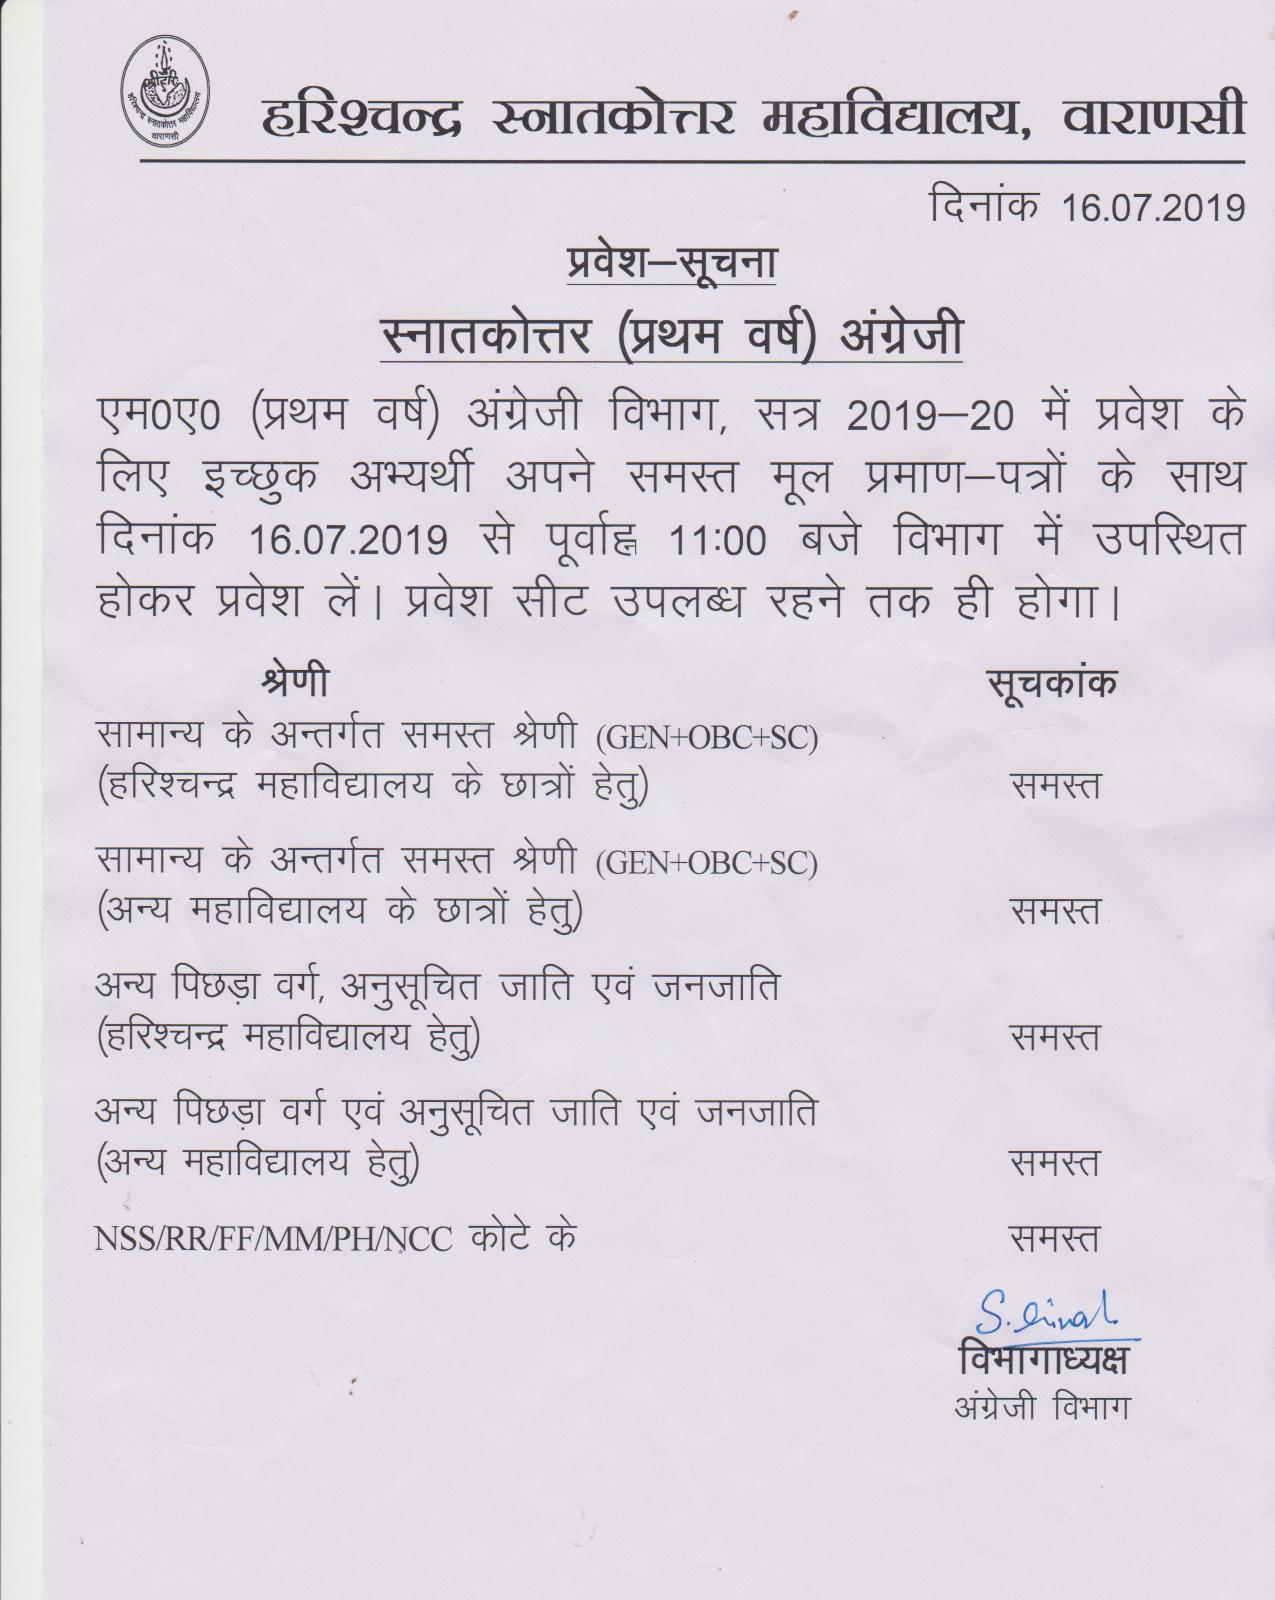 Harish Chandra PG College Varanasi | Government Aided College | HCPG